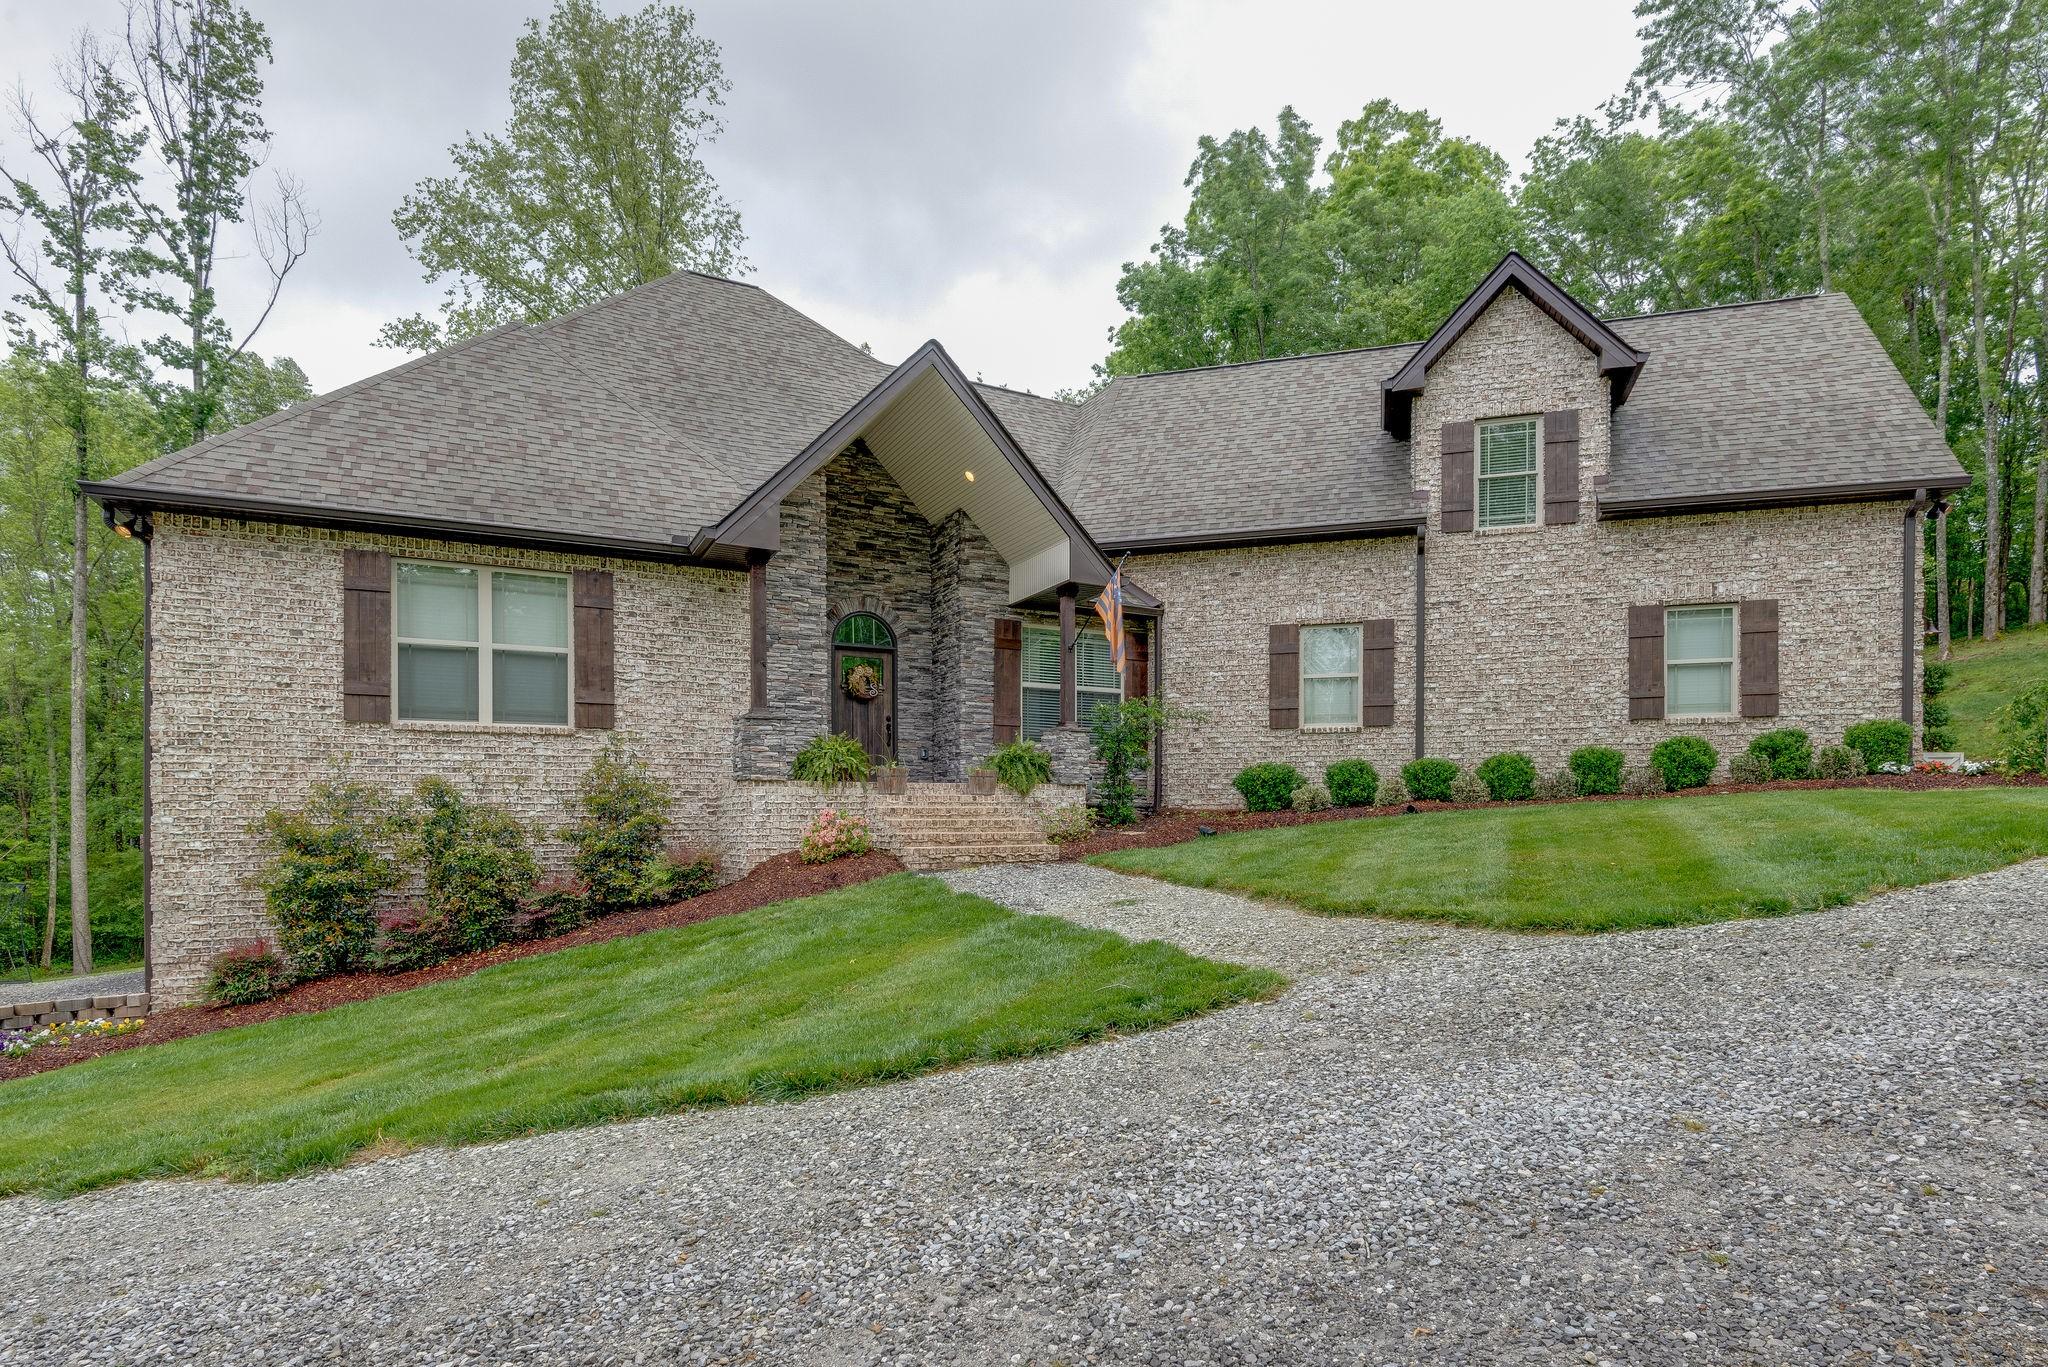 364 E Kingston Springs Rd Property Photo - Kingston Springs, TN real estate listing